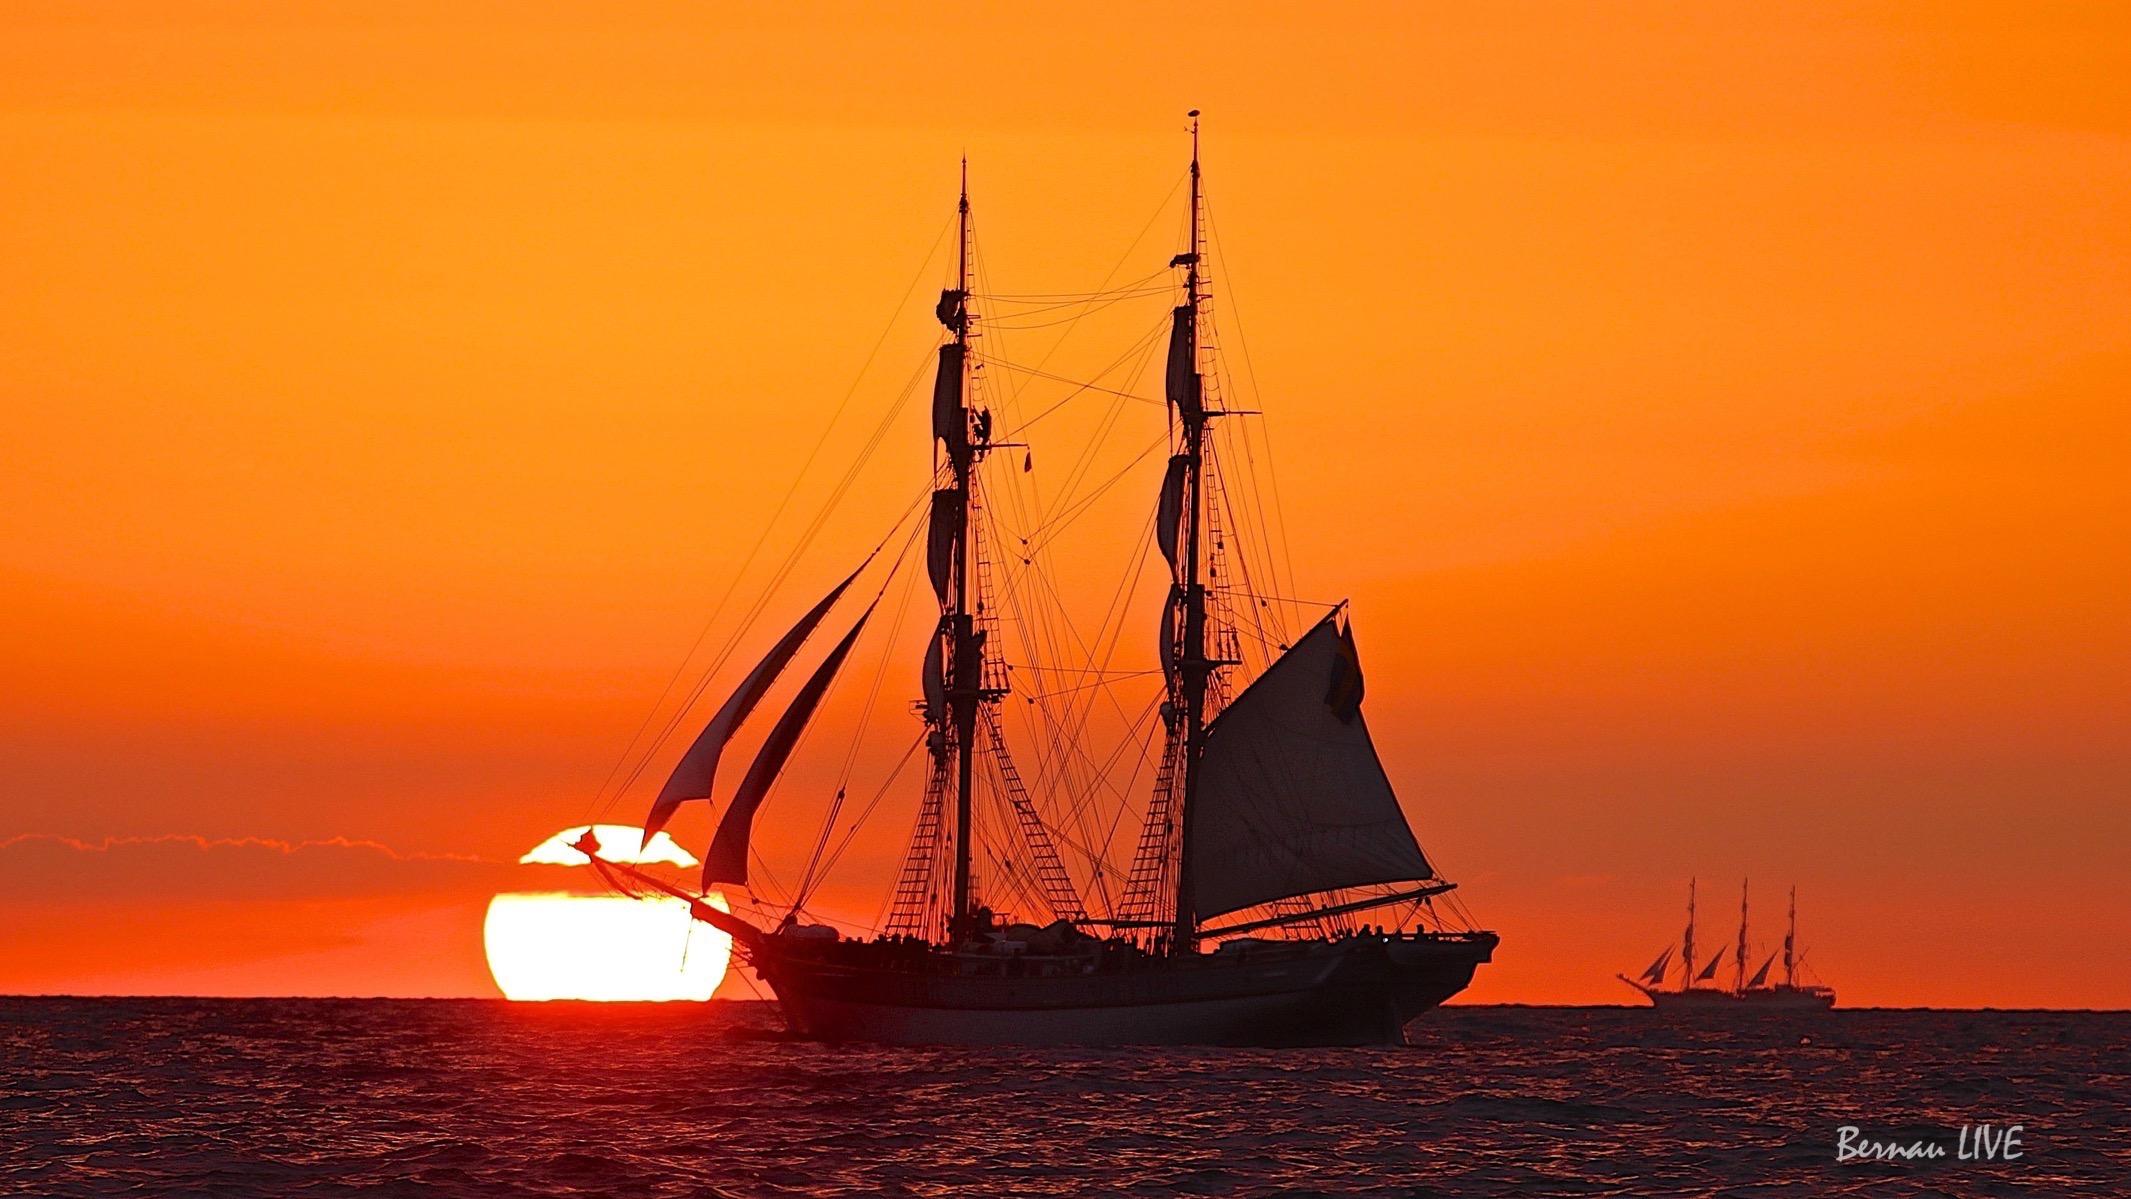 Bernau LIVE, Ostsee, Warnemünde, Hanse Sail, Rostock, Sonnenuntergang, Sommer, Barnim, Hanse Sail 2015, SpereePiX Media, Natur, Wetter, Sail, Schiff